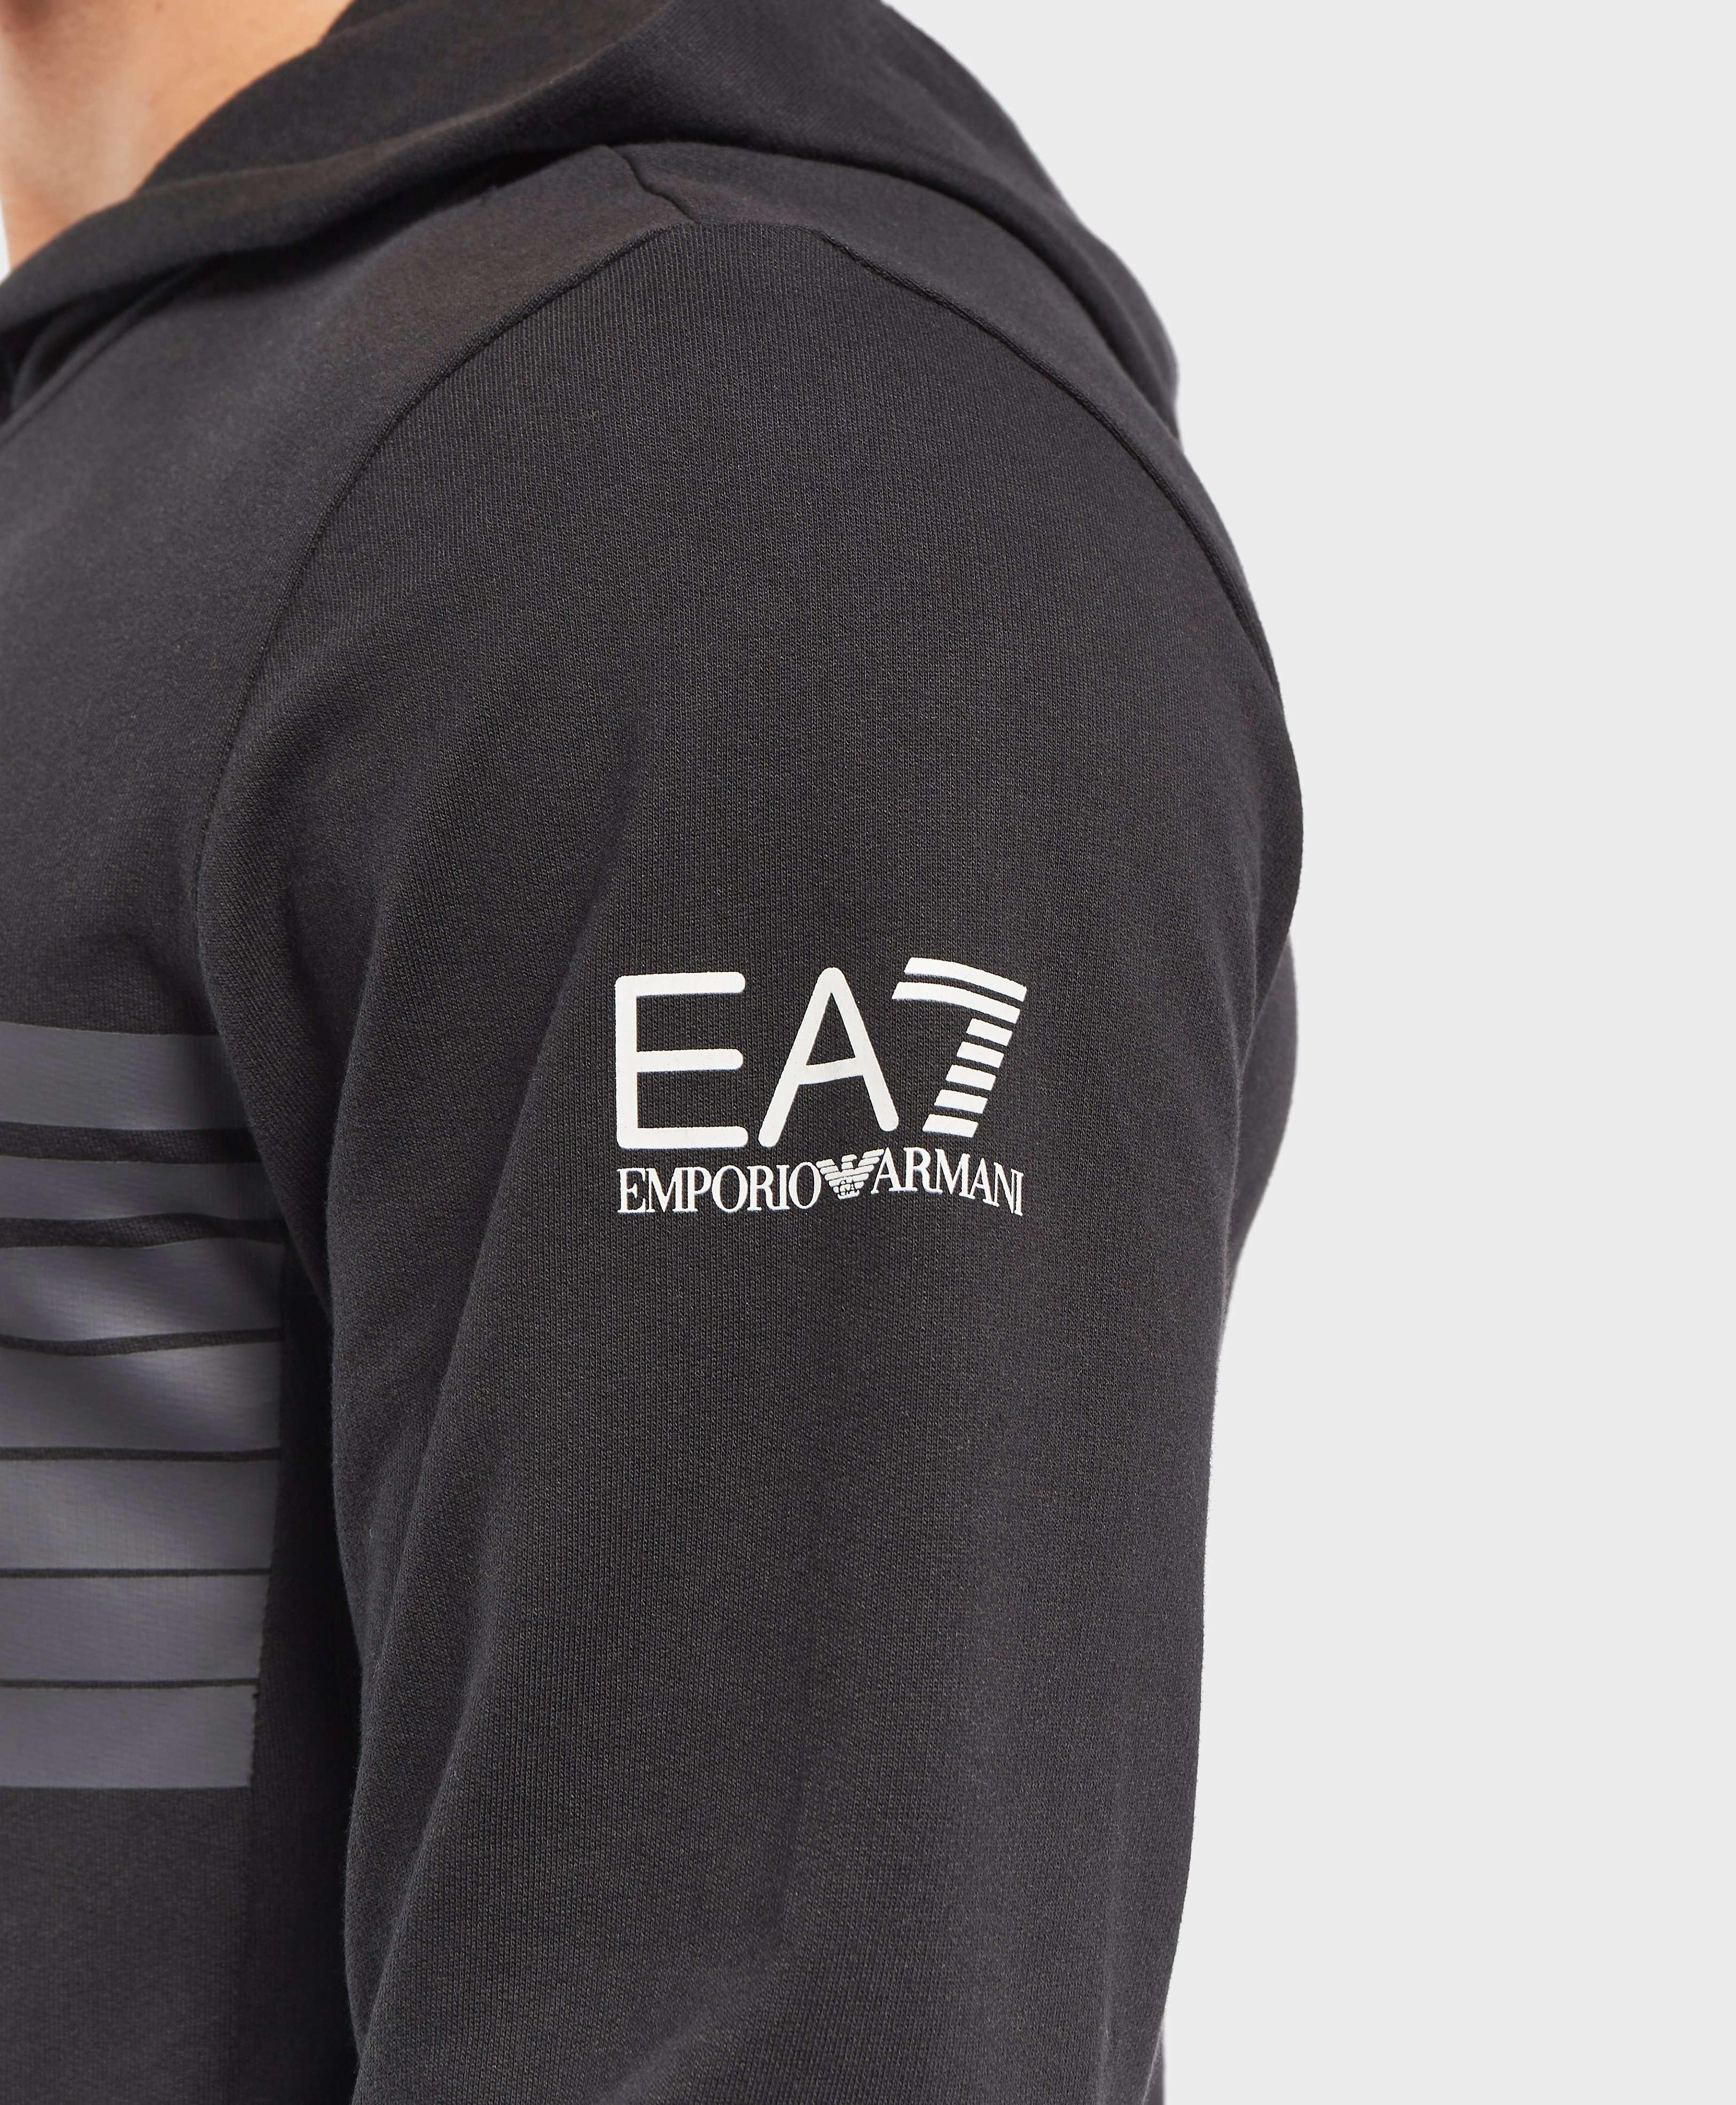 Emporio Armani EA7 Eagle Graphic Overhead Hoodie